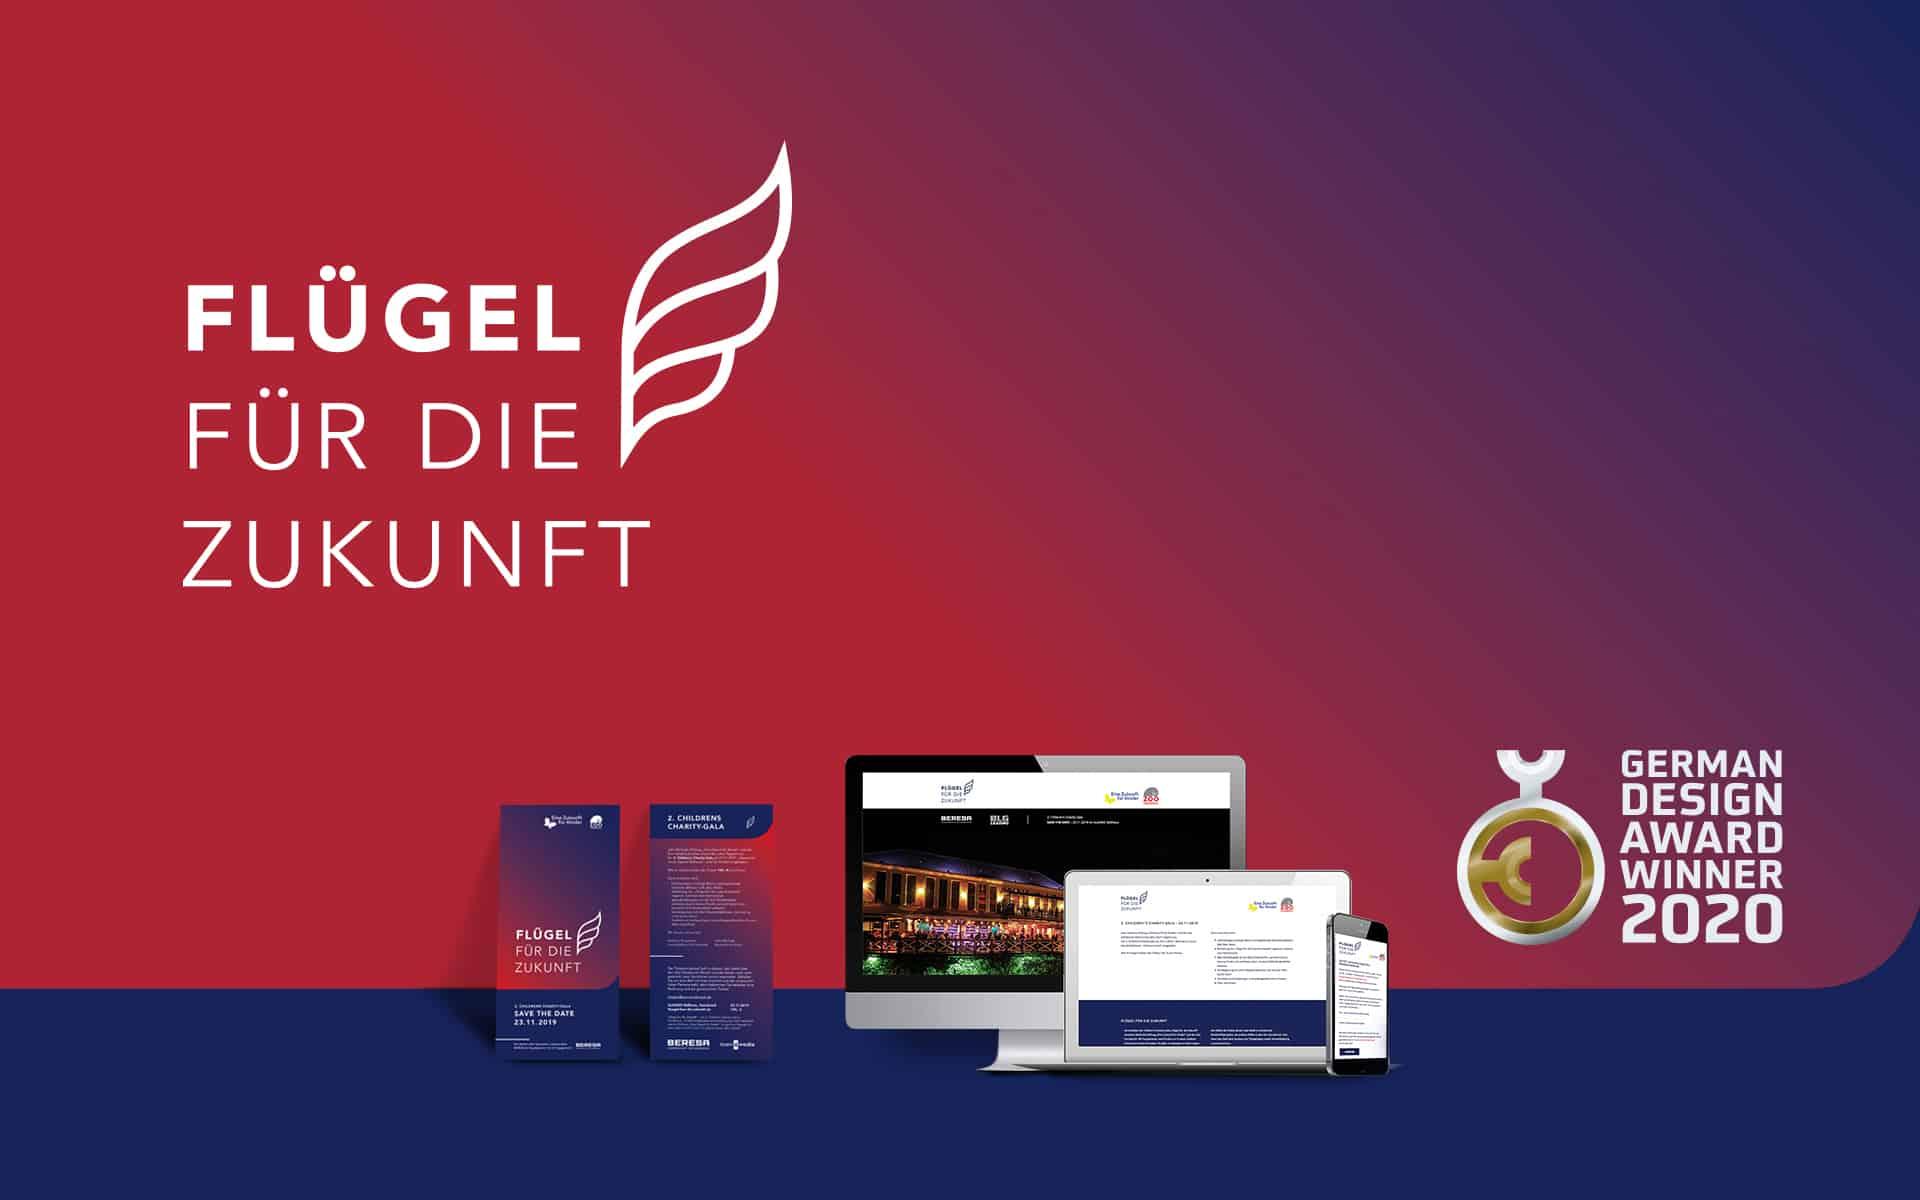 German Design Award team4media